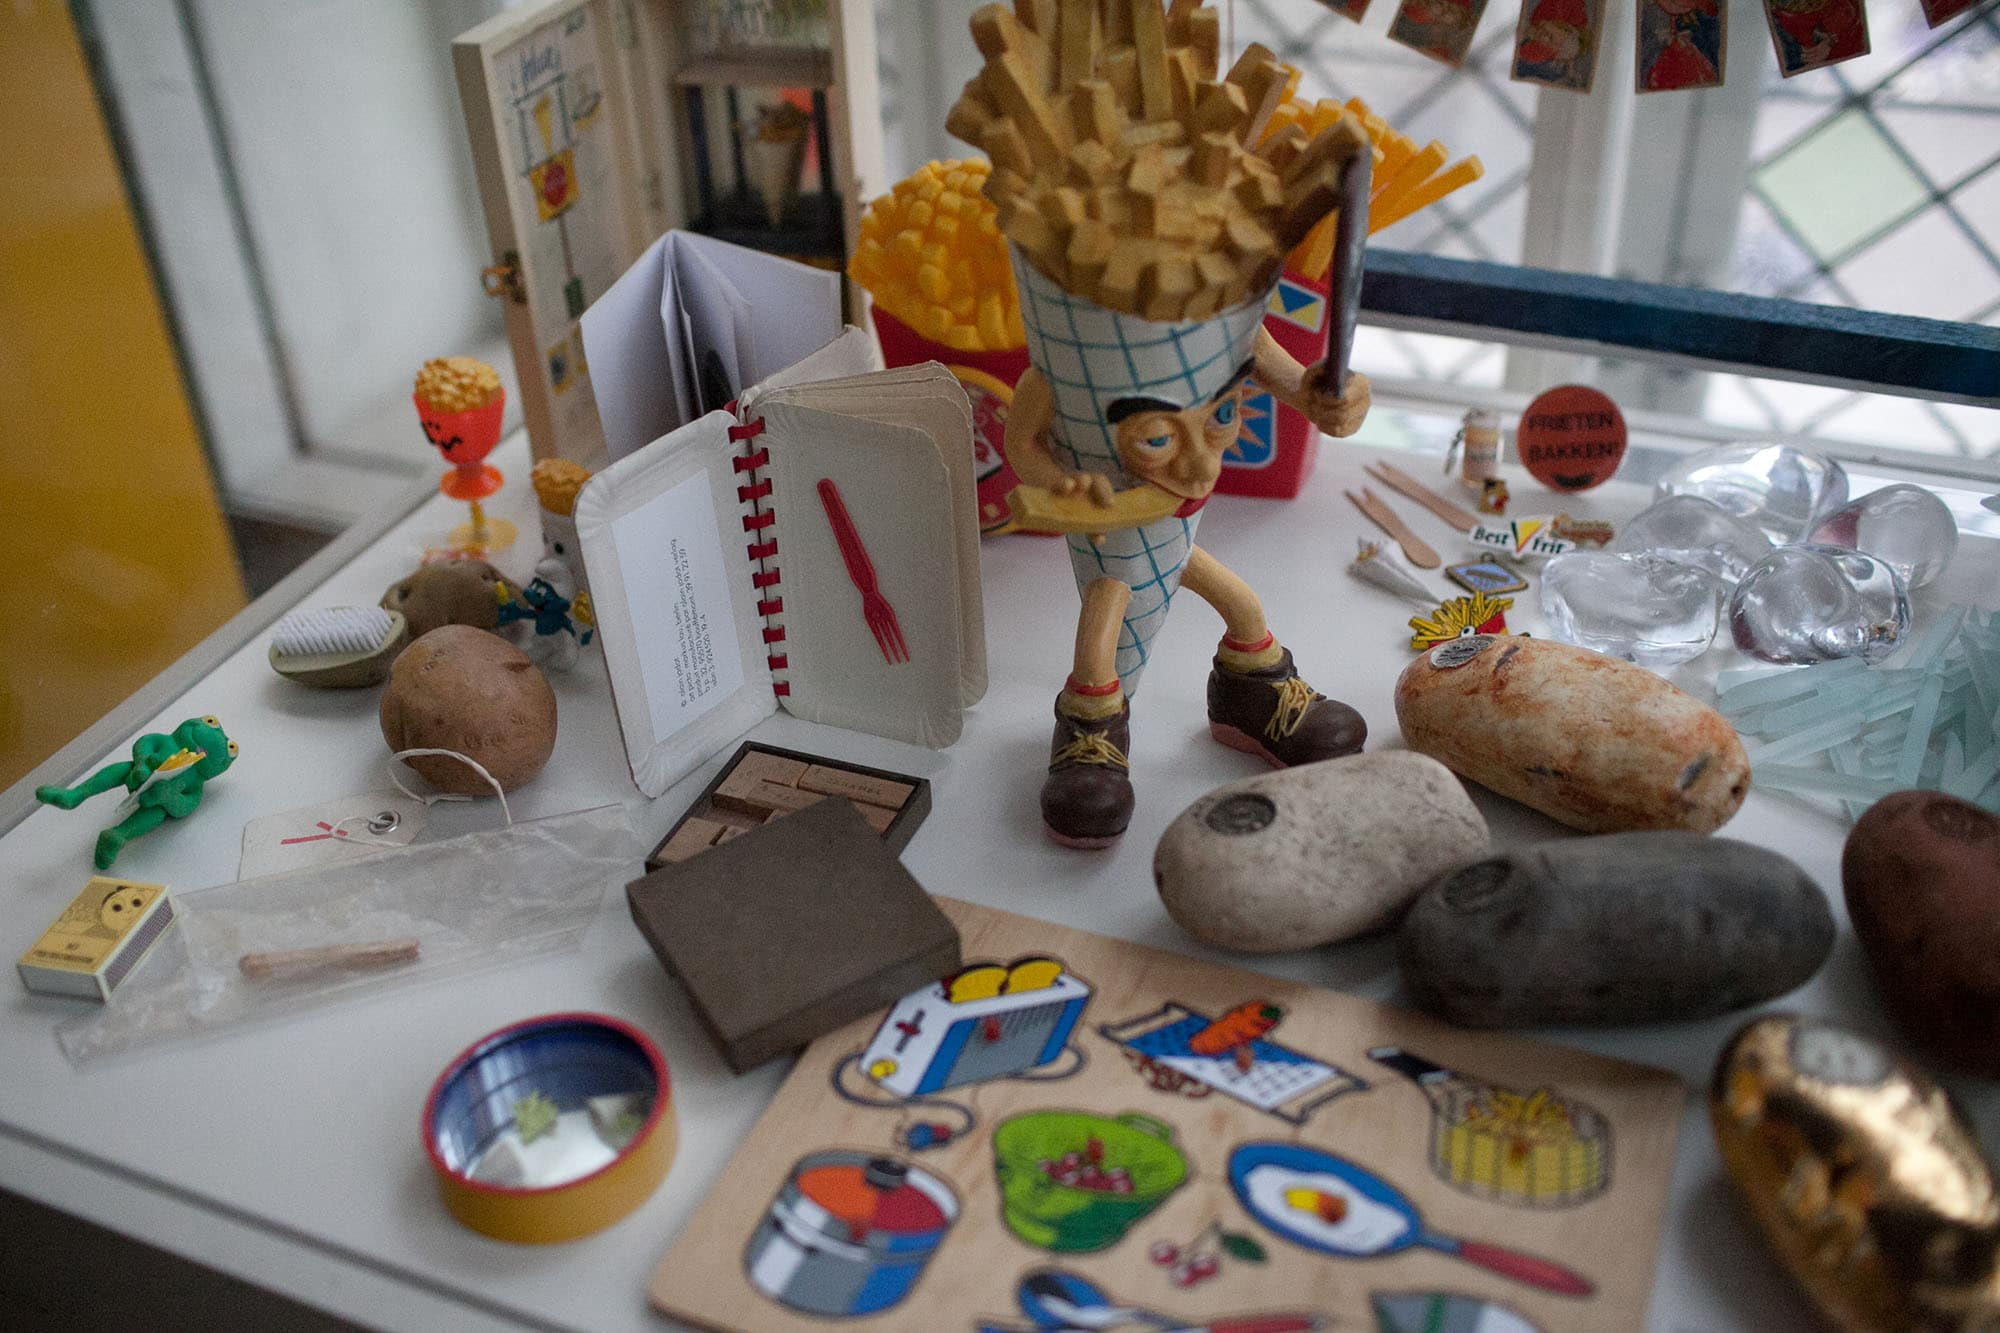 Friet Museum - french fry museum - in Bruges, Belgium